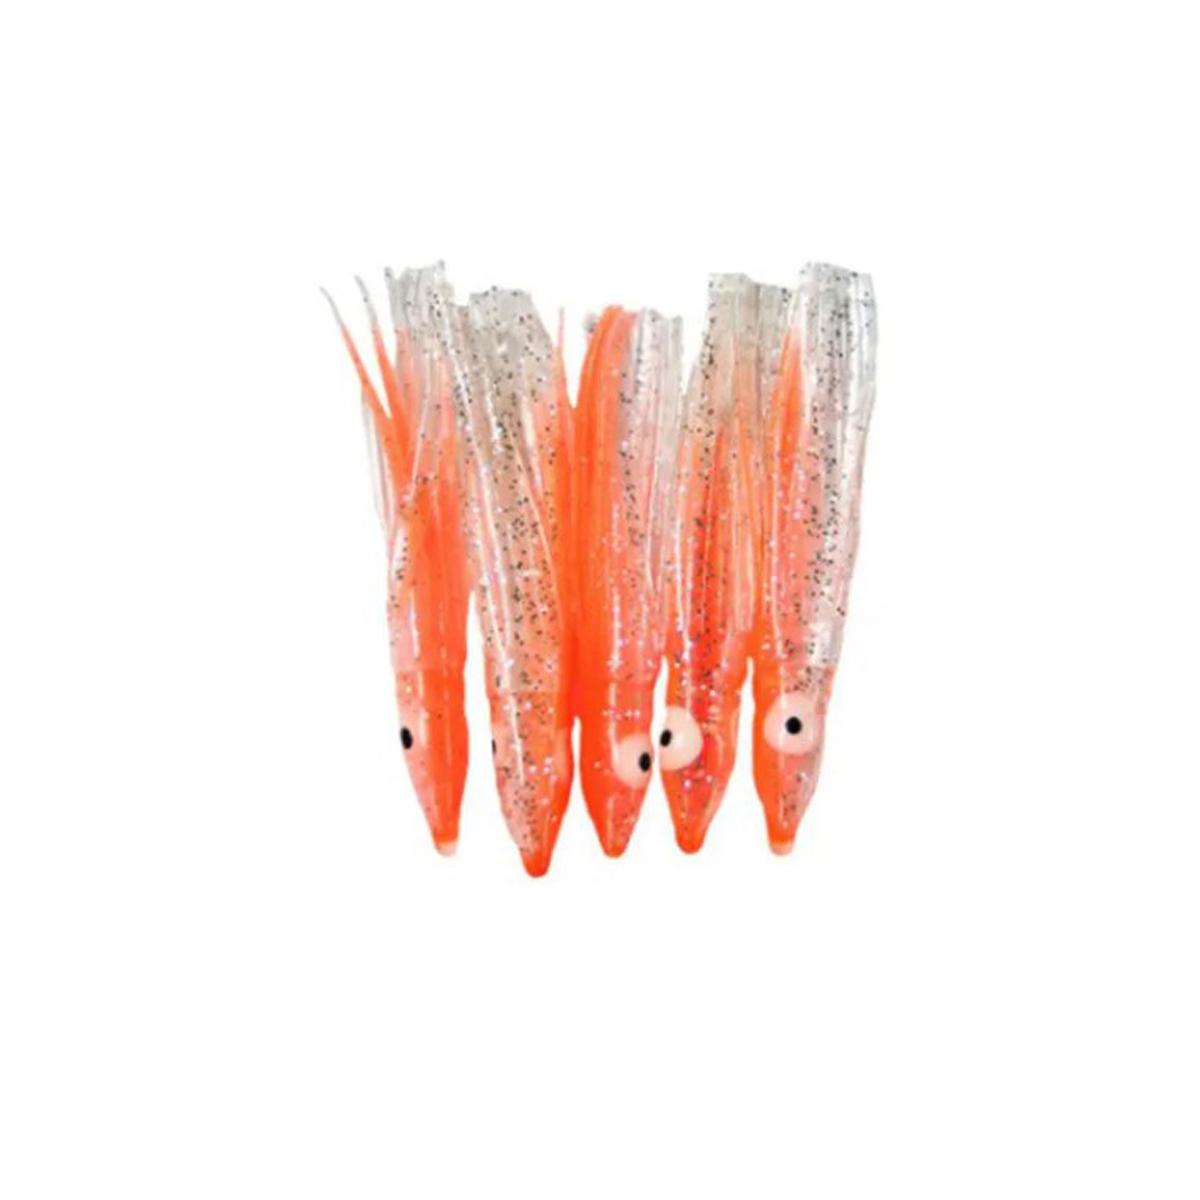 Kit 80 Lulinhas Kalmar 3,8 cm (Laranja)  - Pró Pesca Shop